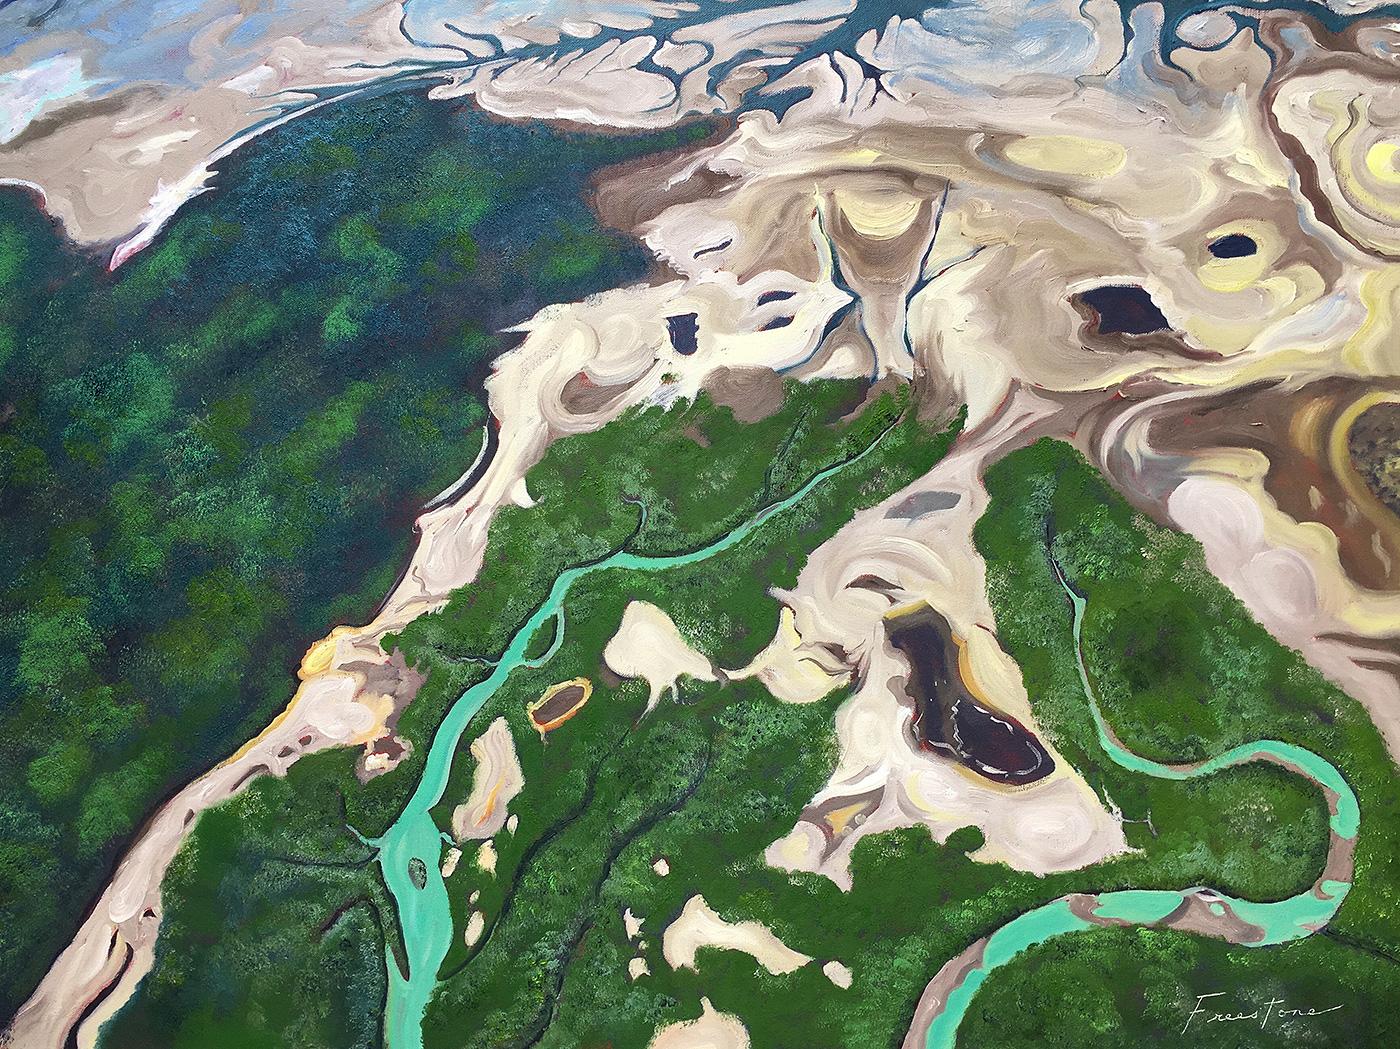 Composition I, Buccaneer Archipelago